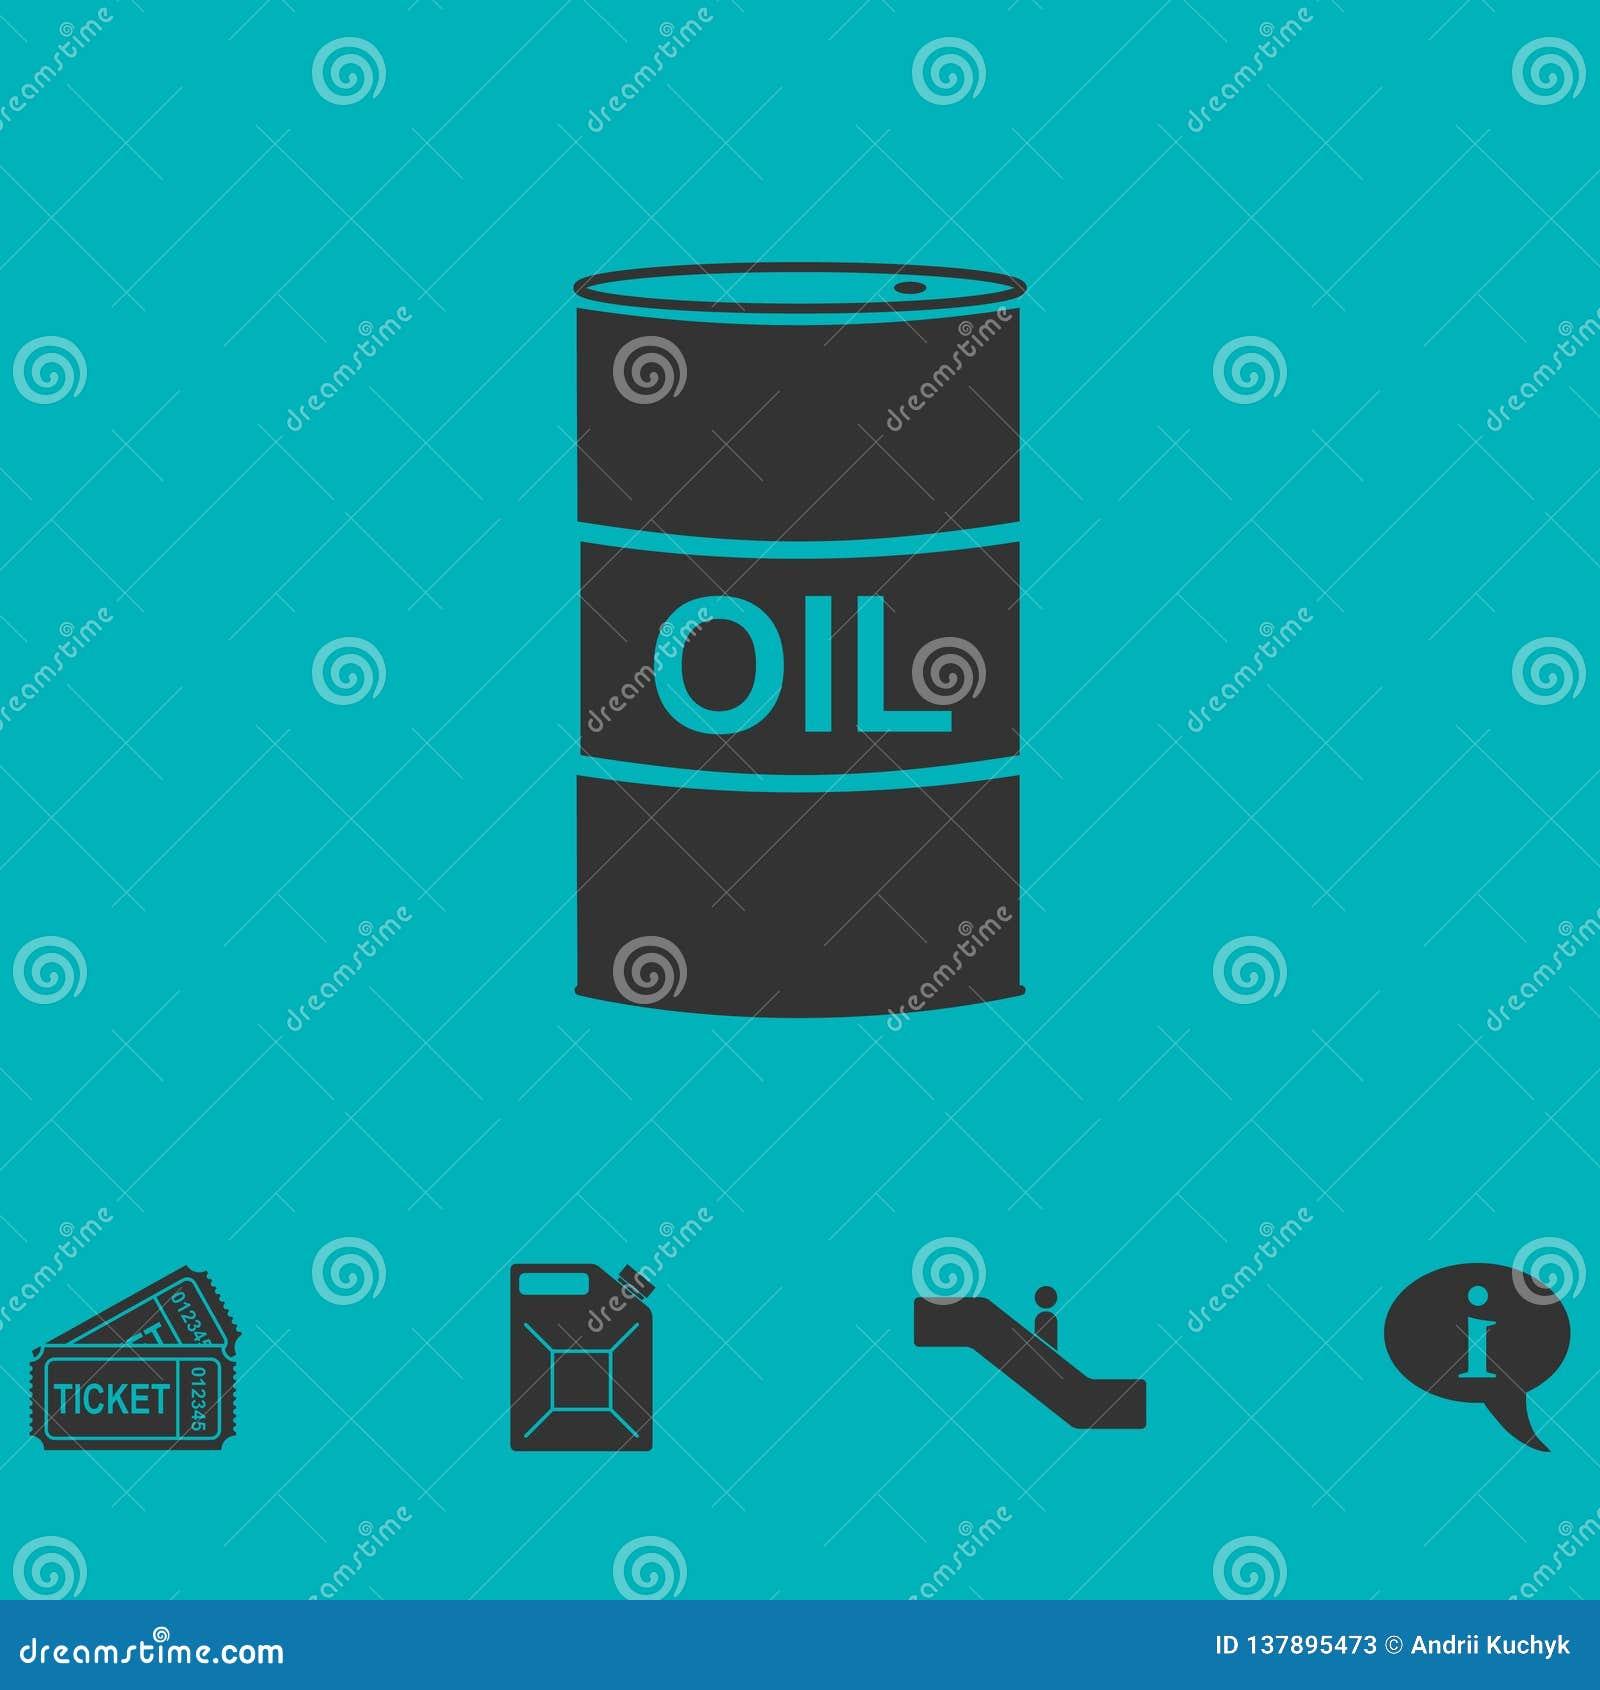 Barrel oil icon flat